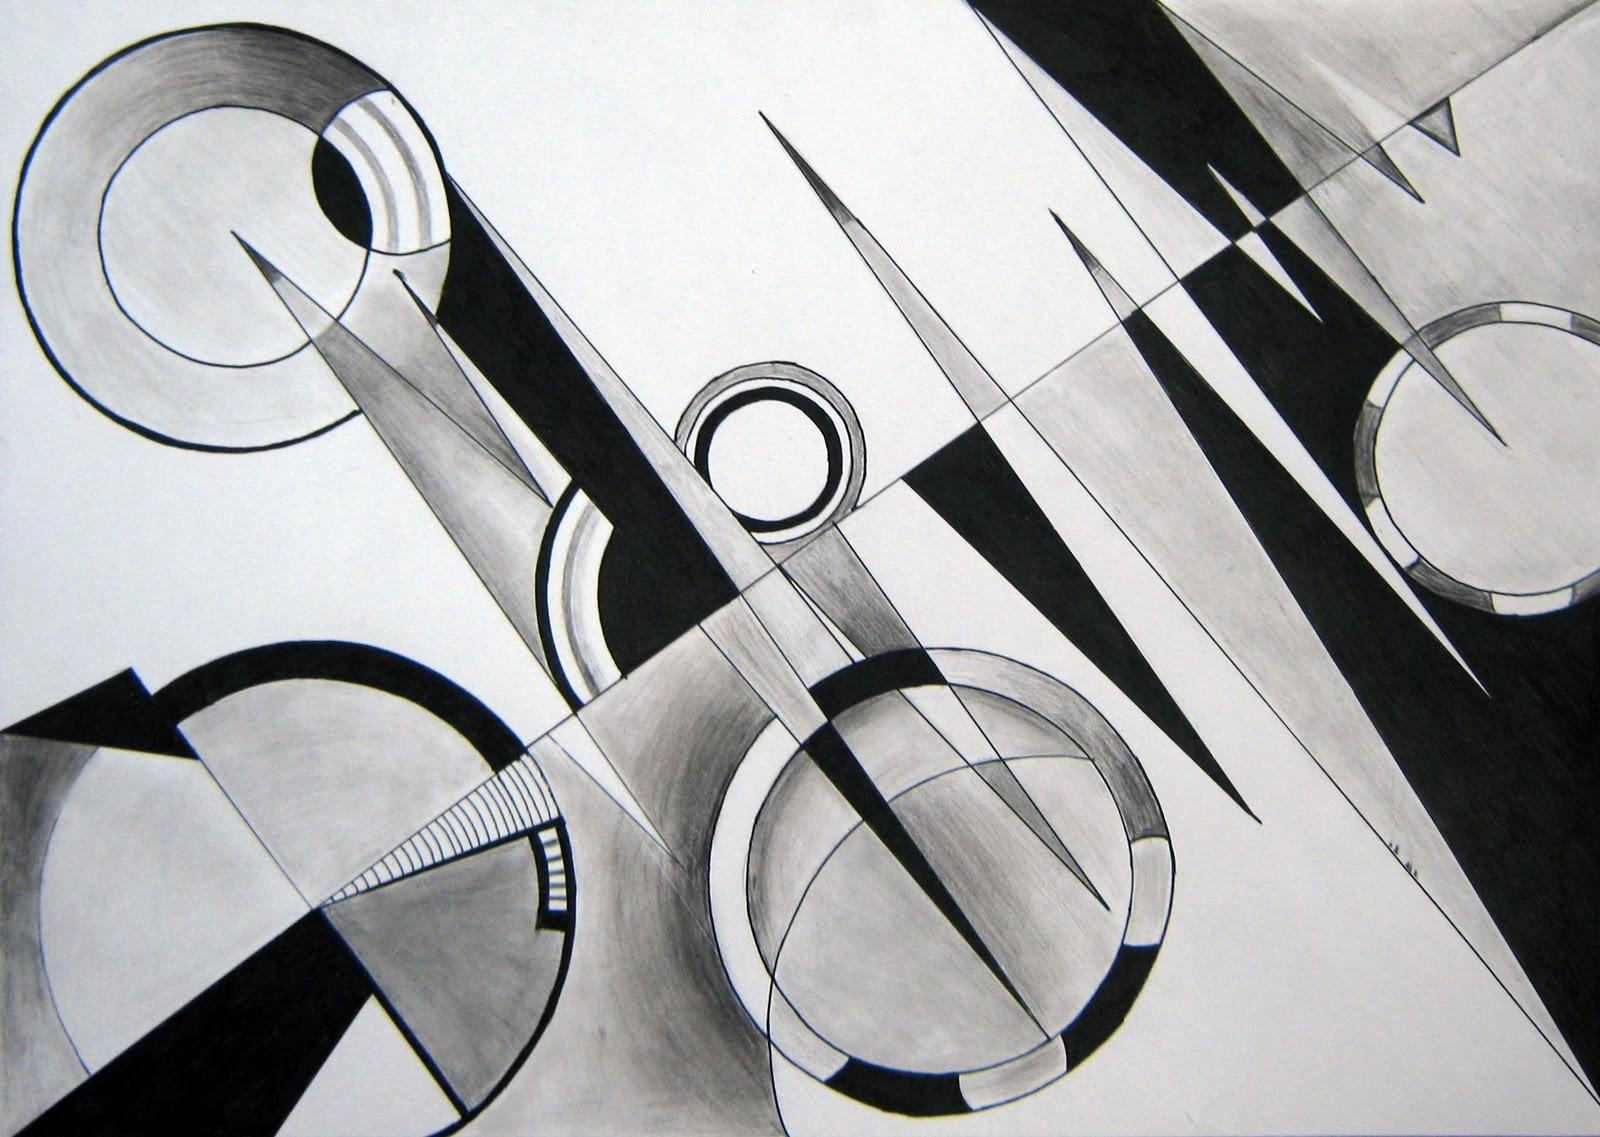 Basic Design And Visual Arts : Dai visual design literacy aram kim december